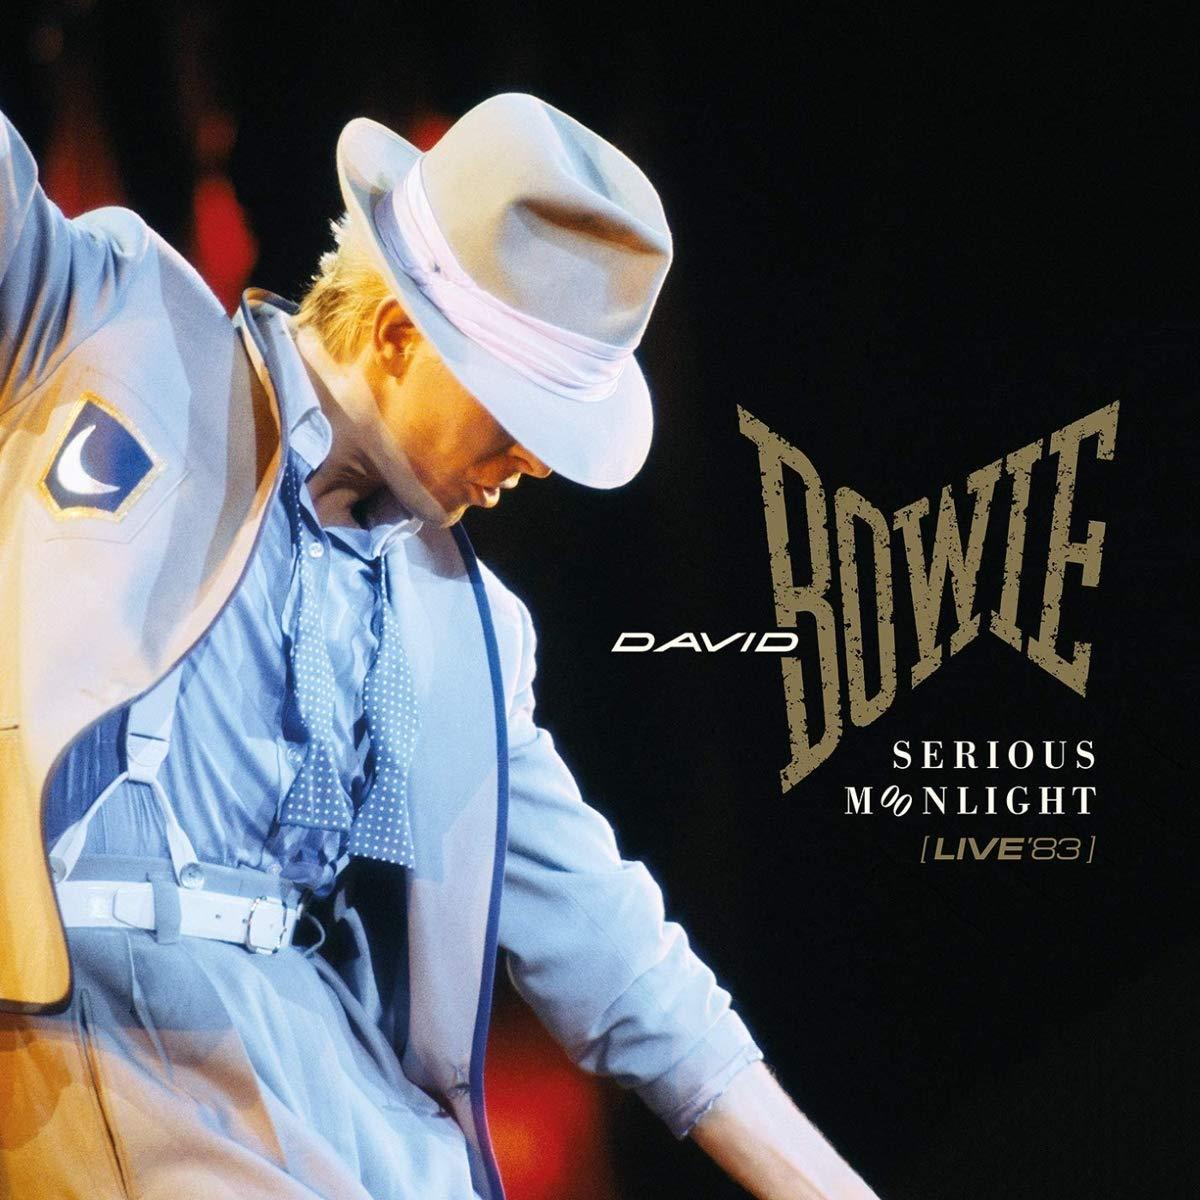 David Bowie serious moonlight live 83 copertina cover